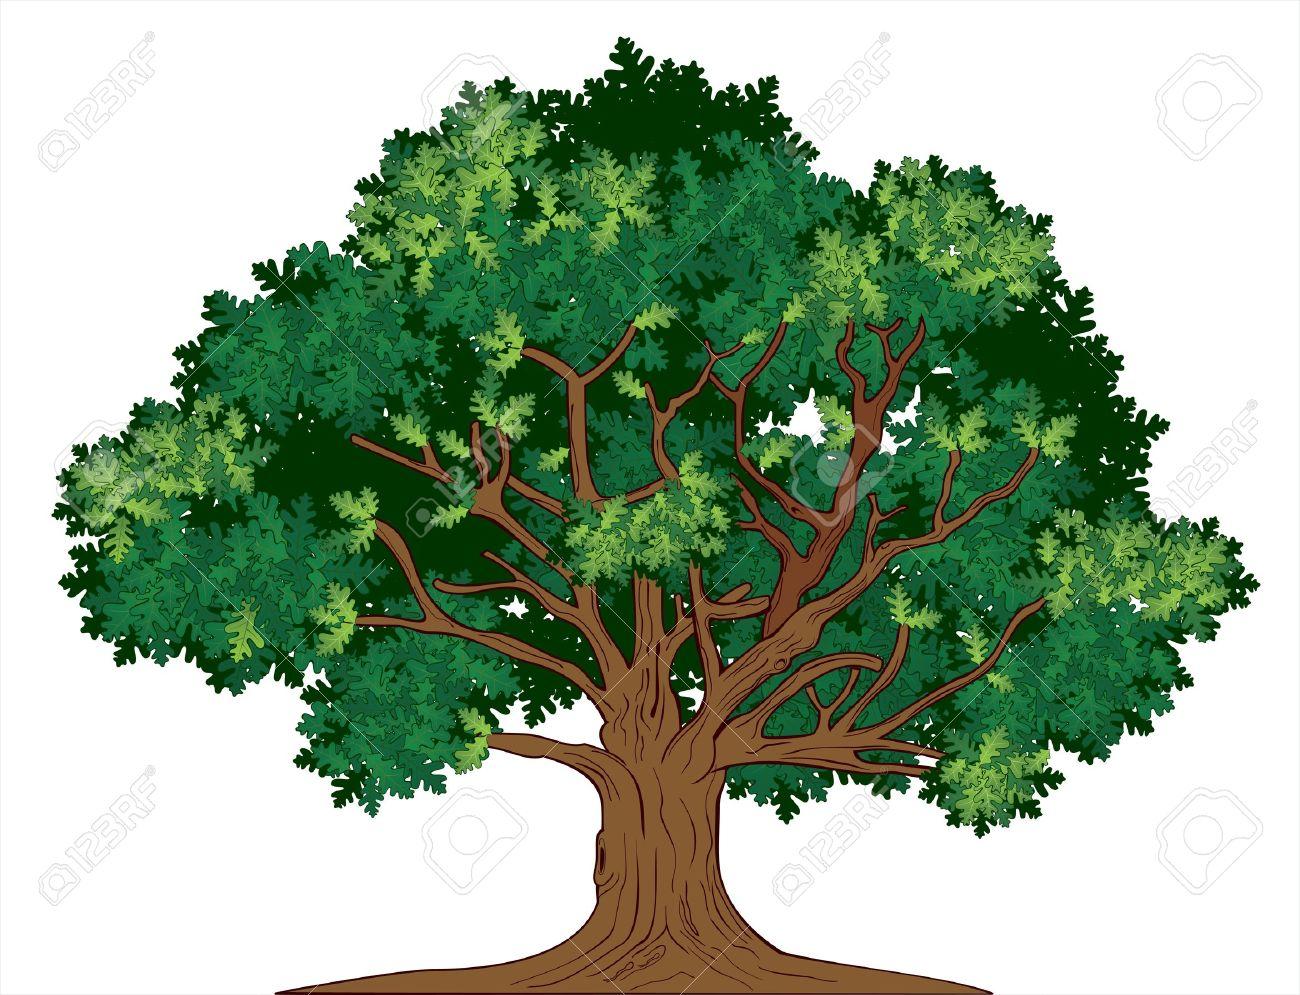 Vector illustration of old green oak tree - 16060264